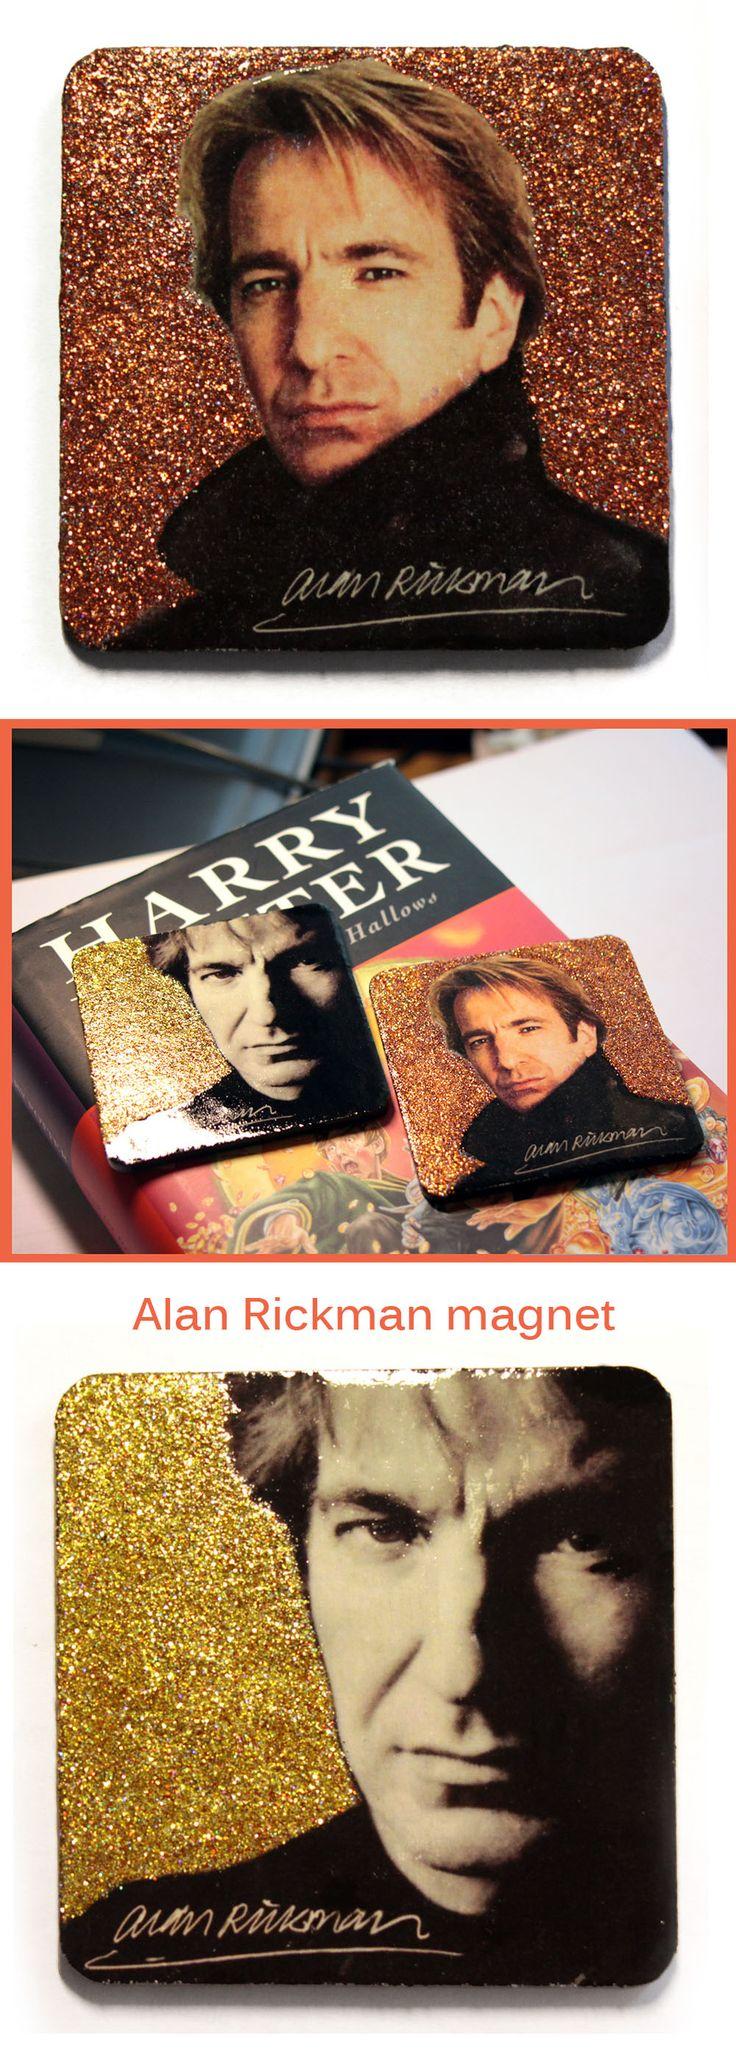 Alan Rickman art, Alan Rickman gift, fridge magnet. Handmade fanart Harry Potter, Severus Snape.